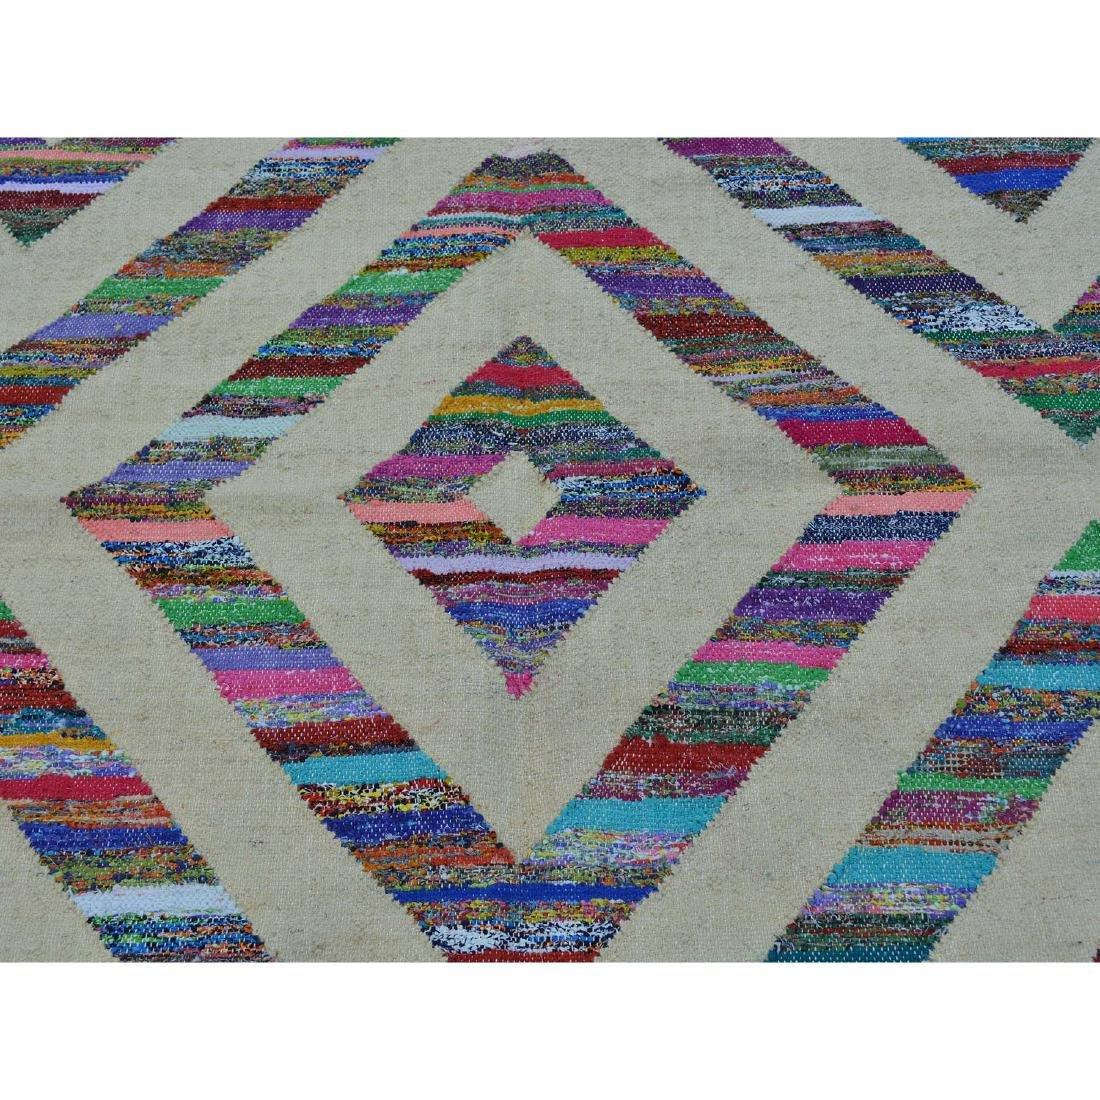 Durie Kilim Wool & Sari Silk Flat Weave Rug 5x7.2 - 4